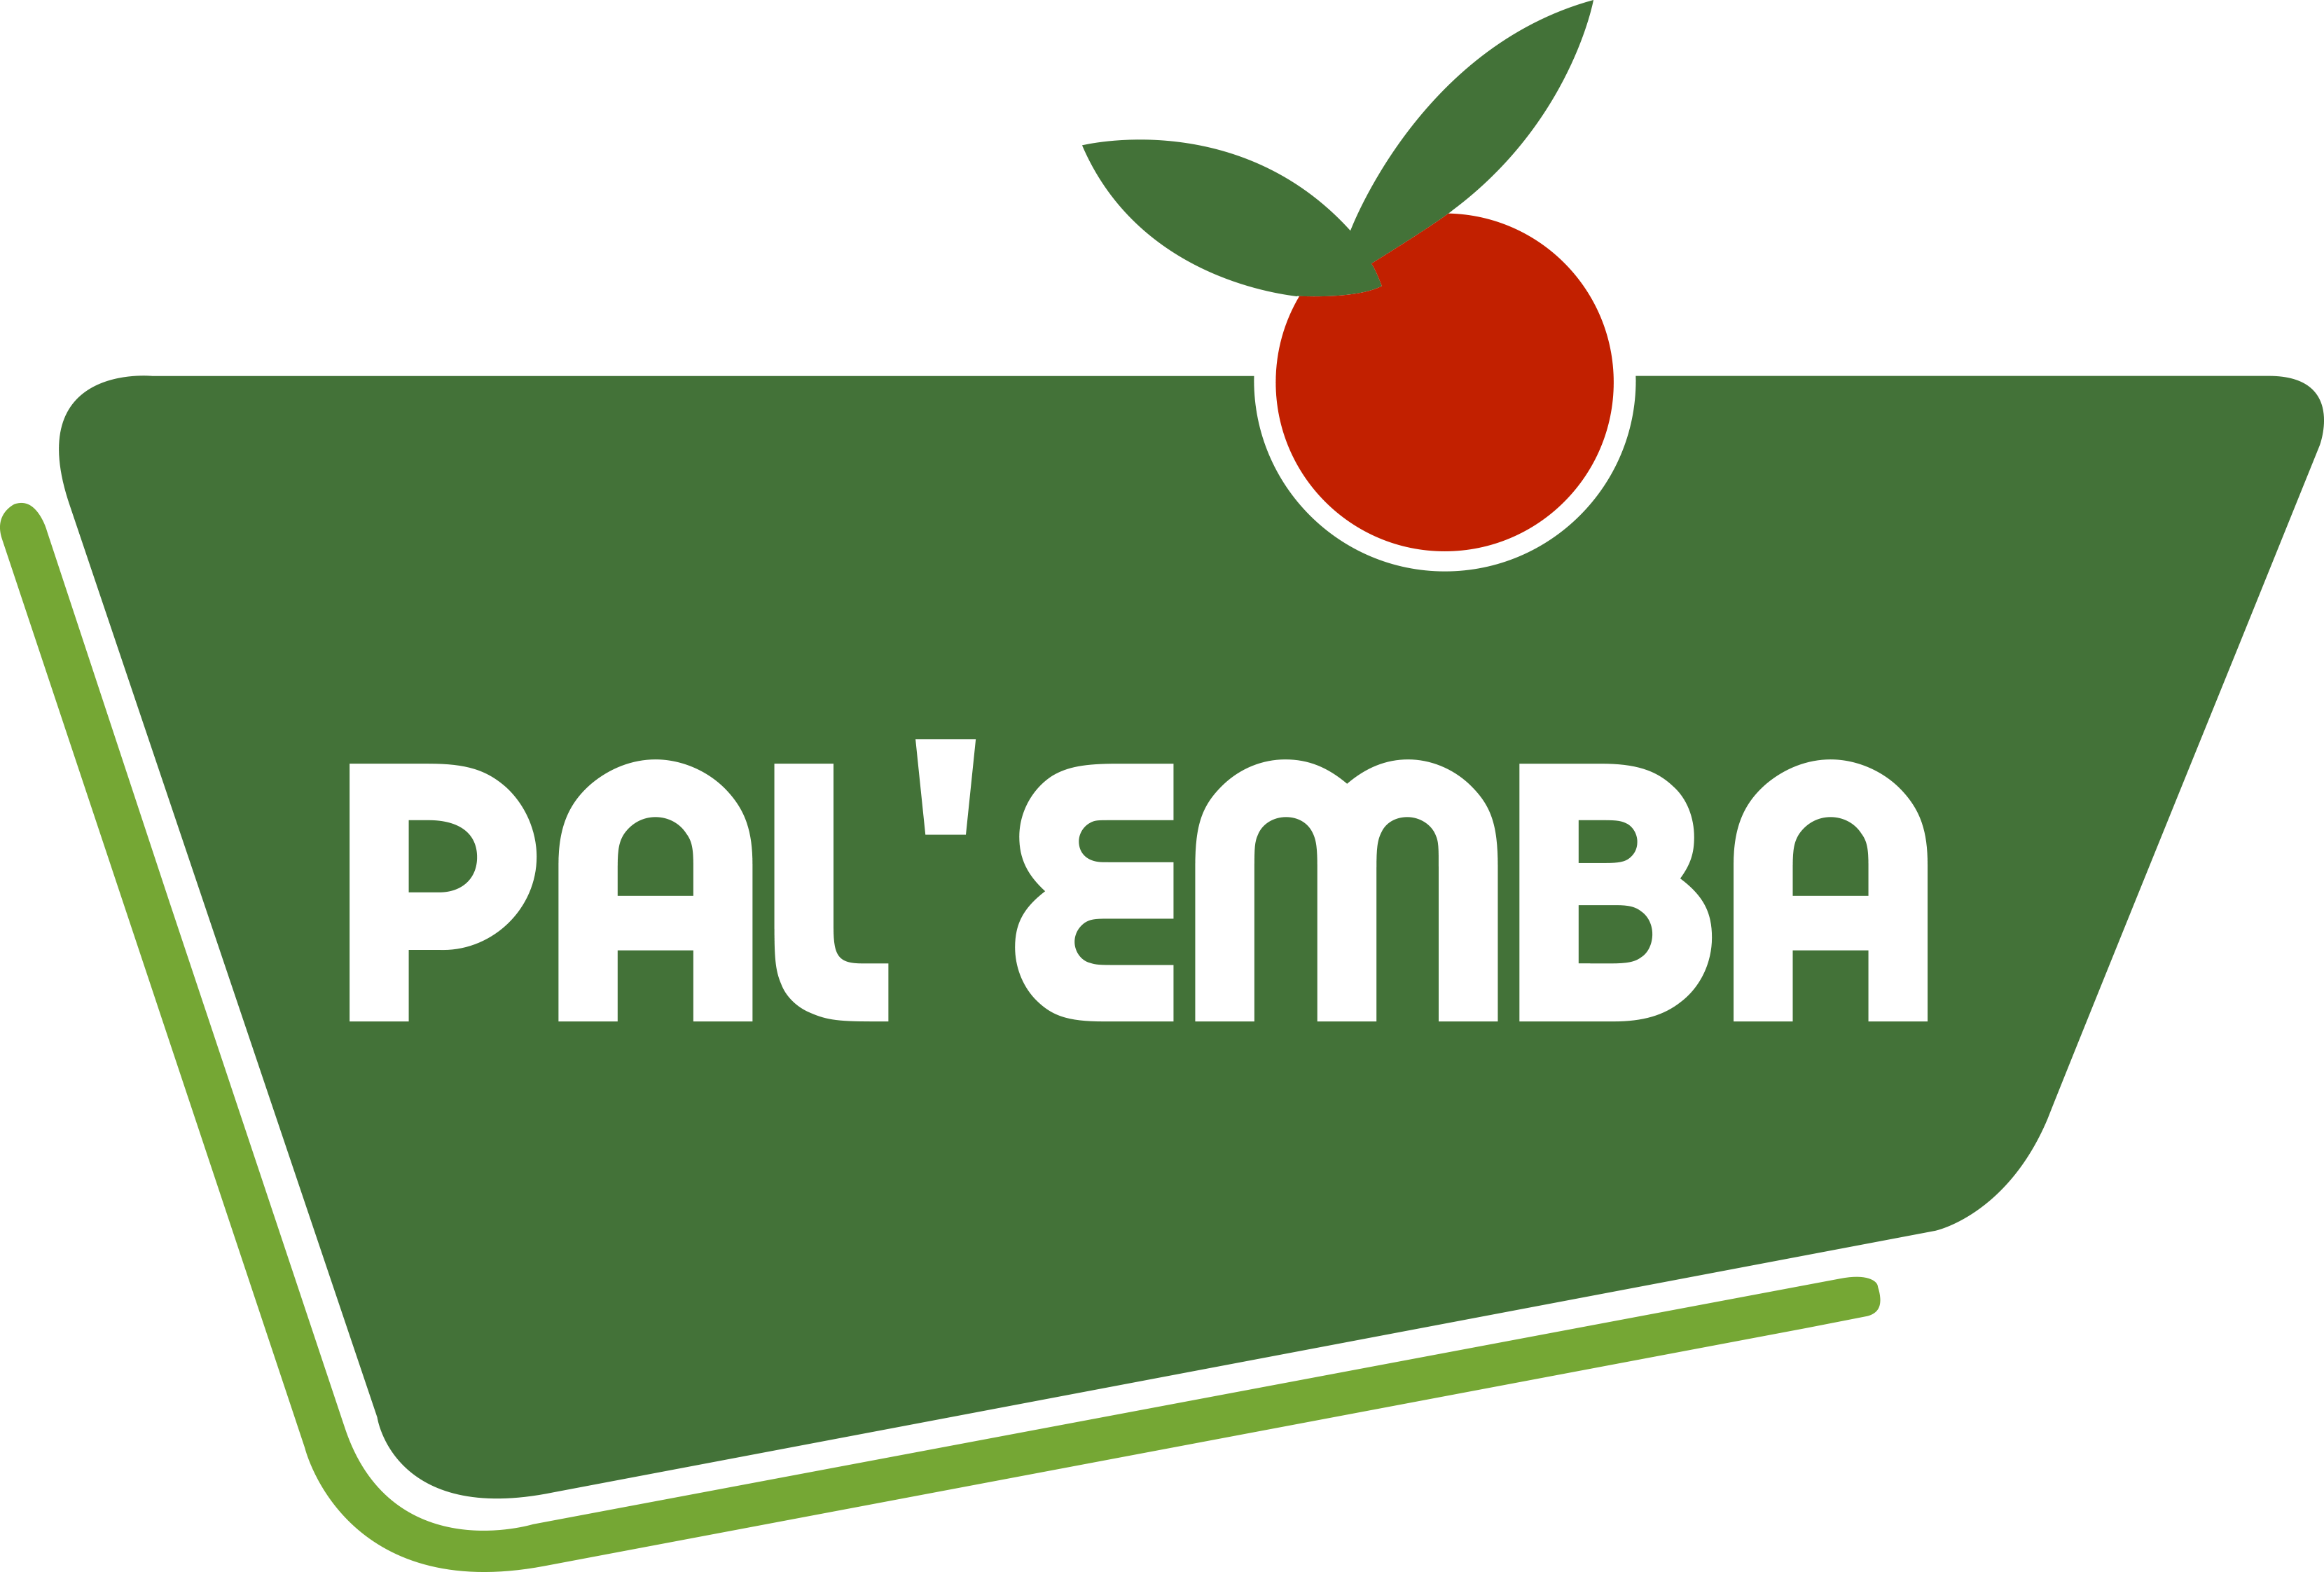 Palemba_RVB